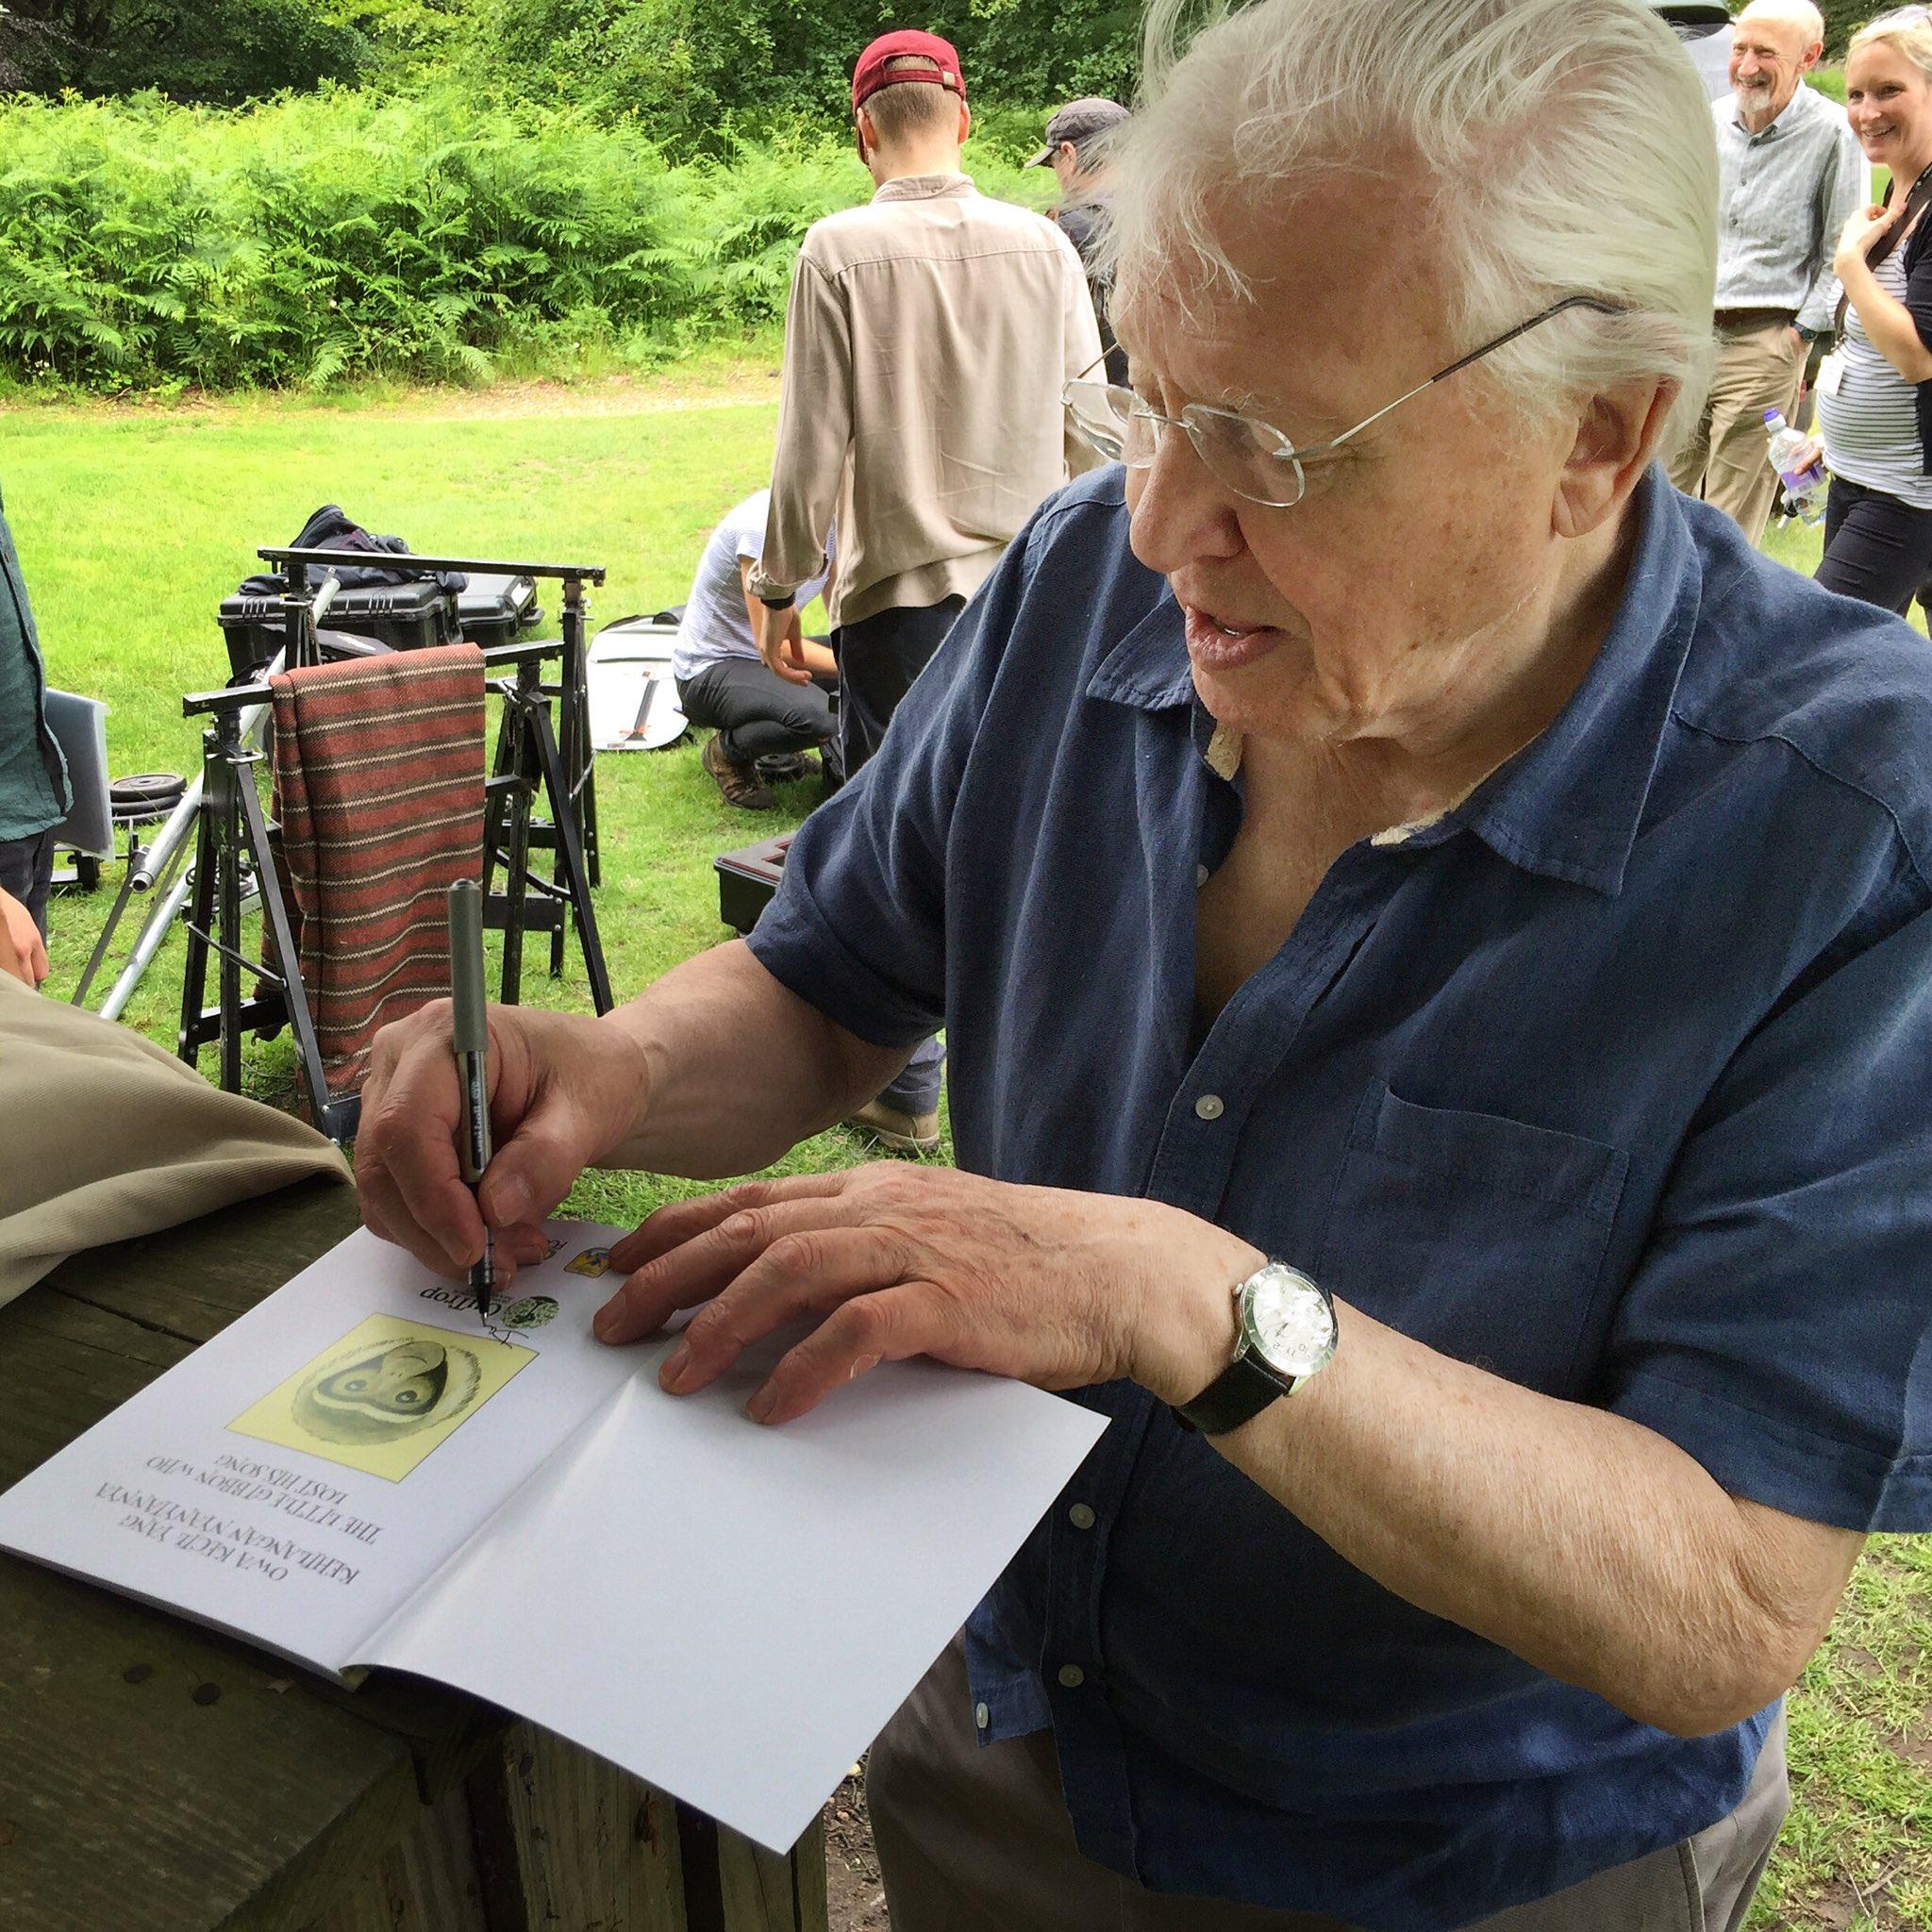 Meeting her inspiration David Attenborough